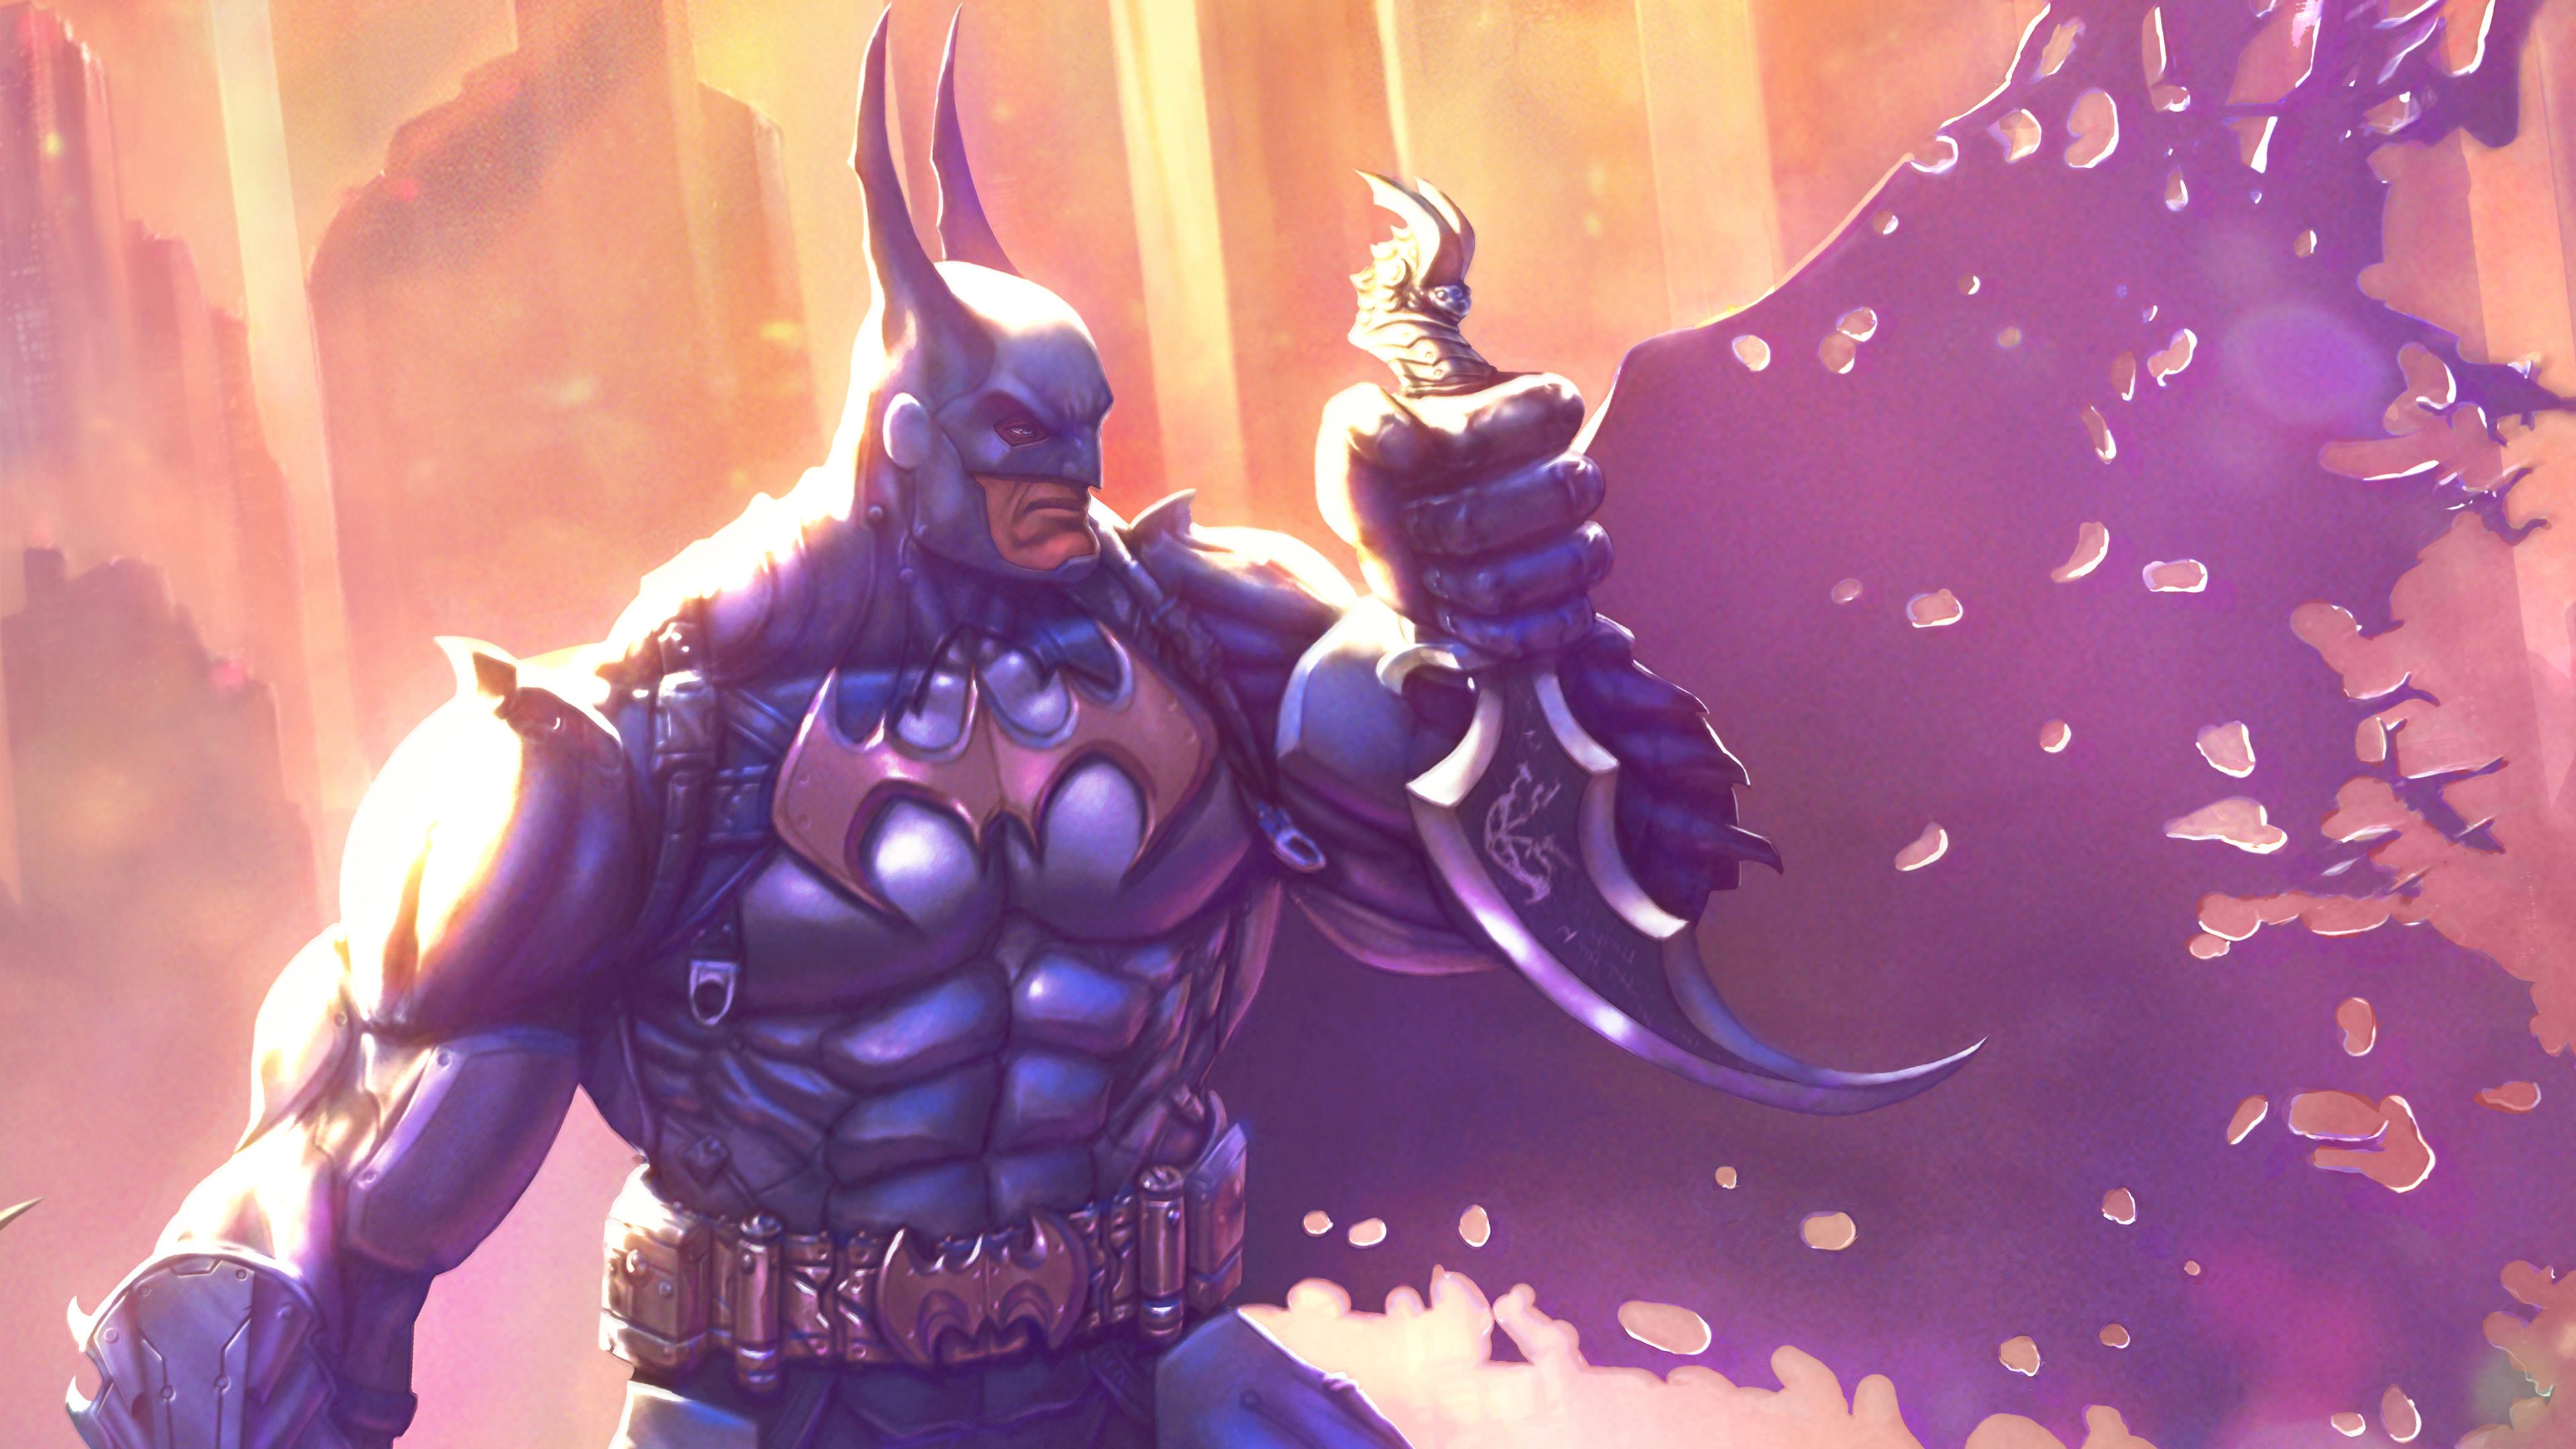 batman of gotham 4k 1556184894 - Batman Of Gotham 4k - superheroes wallpapers, hd-wallpapers, digital art wallpapers, batman wallpapers, artwork wallpapers, 4k-wallpapers